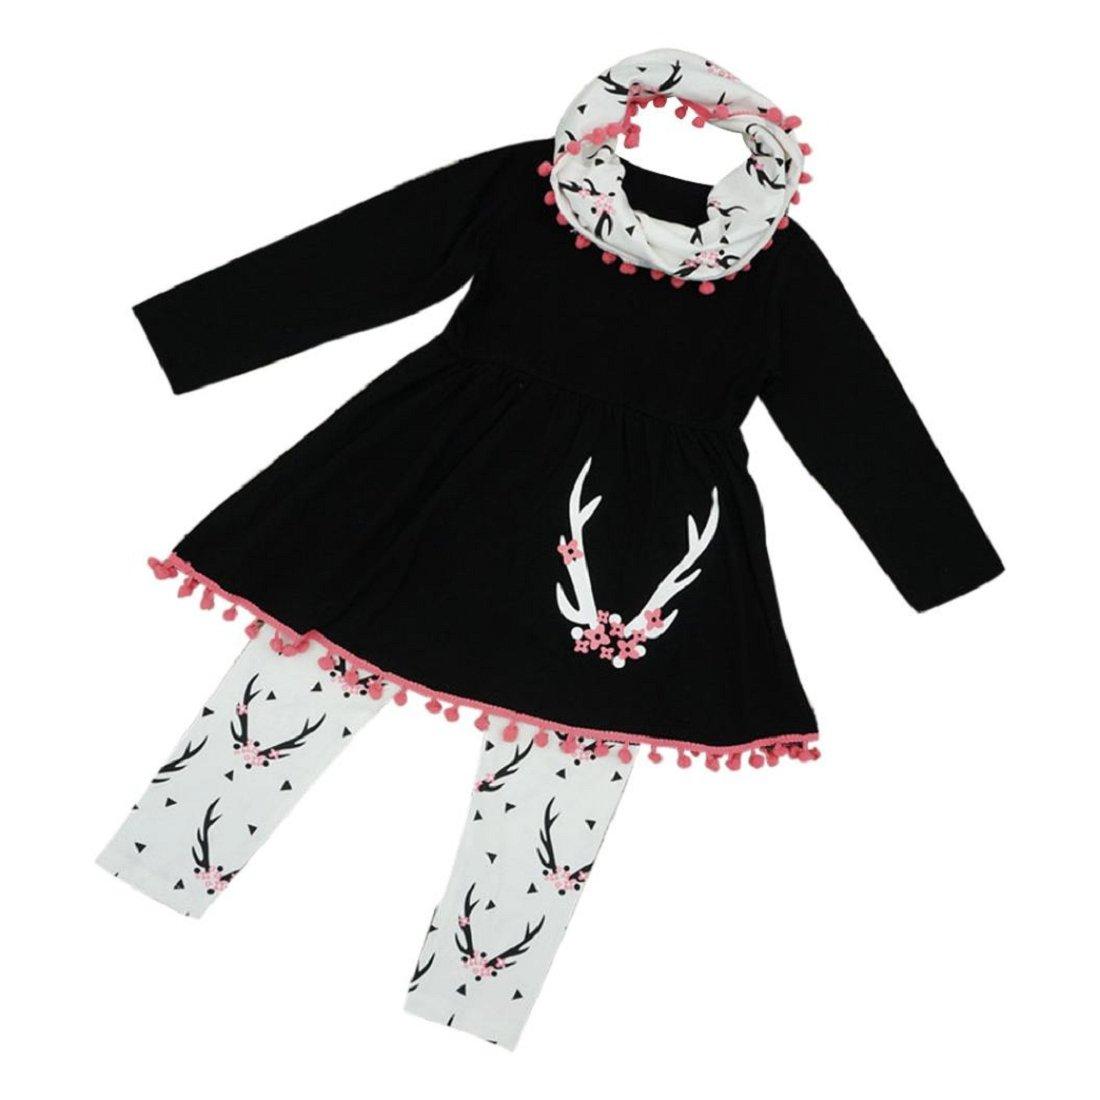 GONKOMA Girls Winter Tunic Dress Clothes Pants Scarf 3PCS Outfits Kids Clothes Set